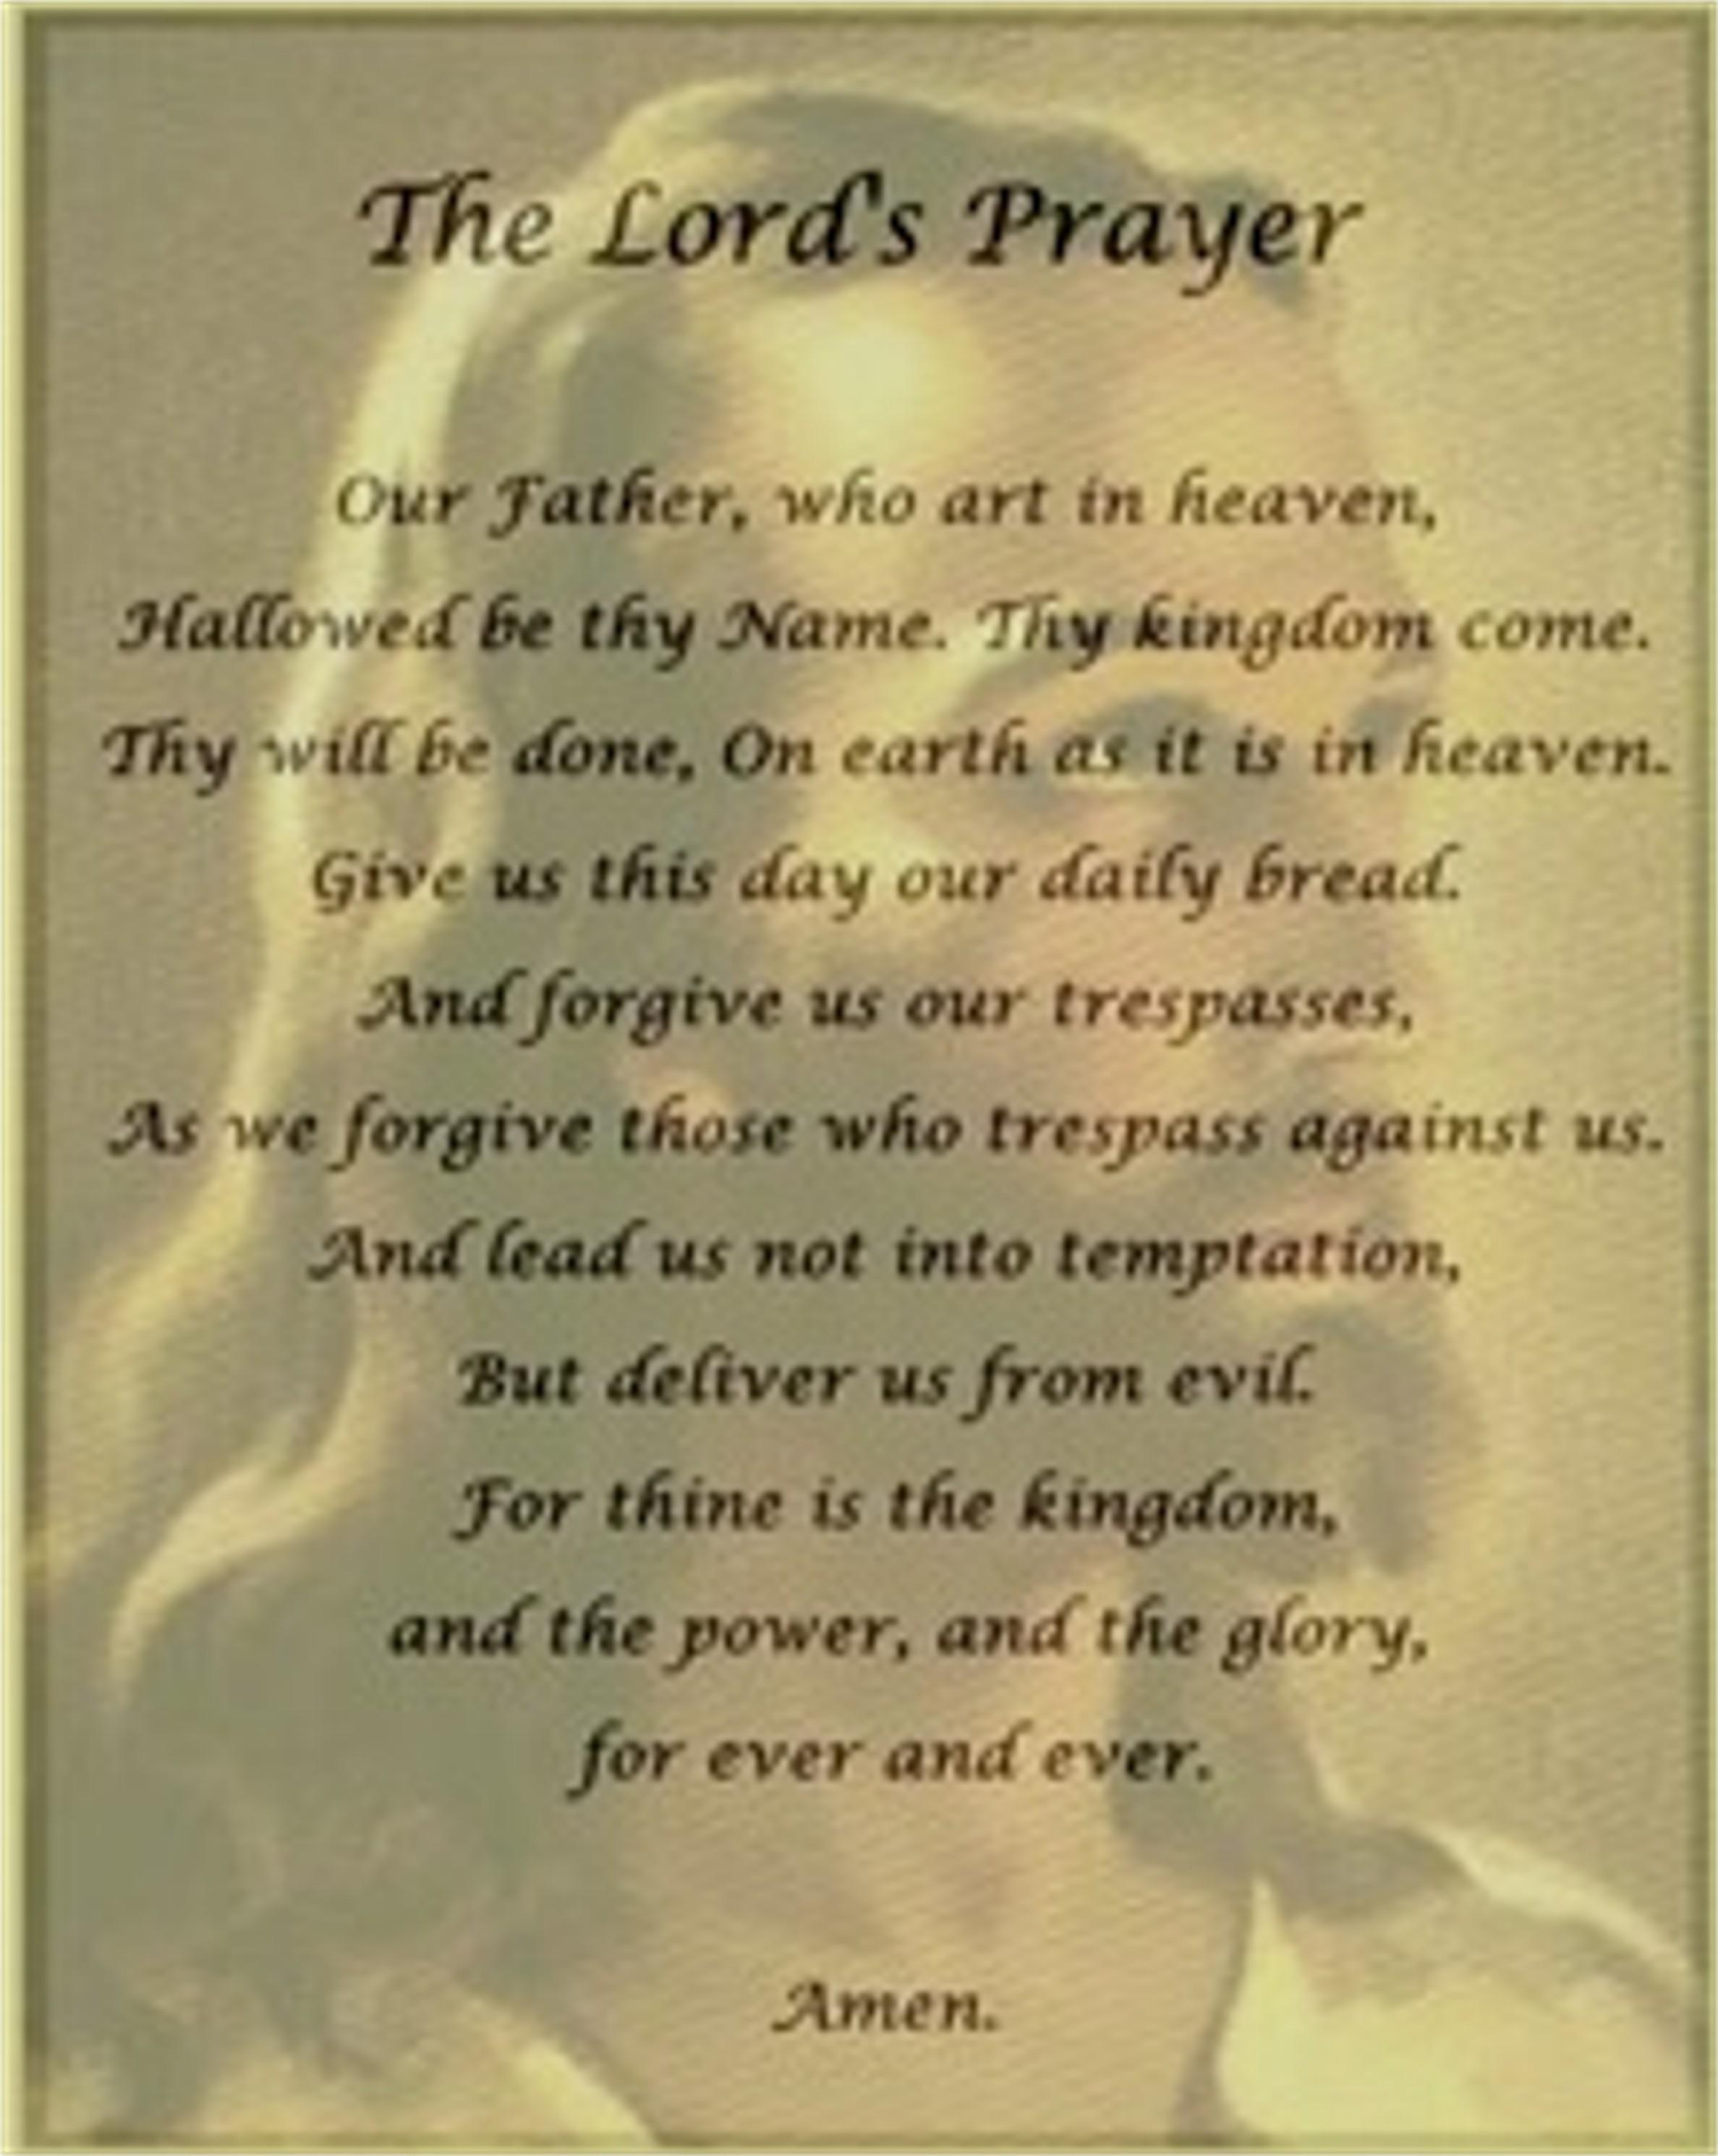 The national prayer